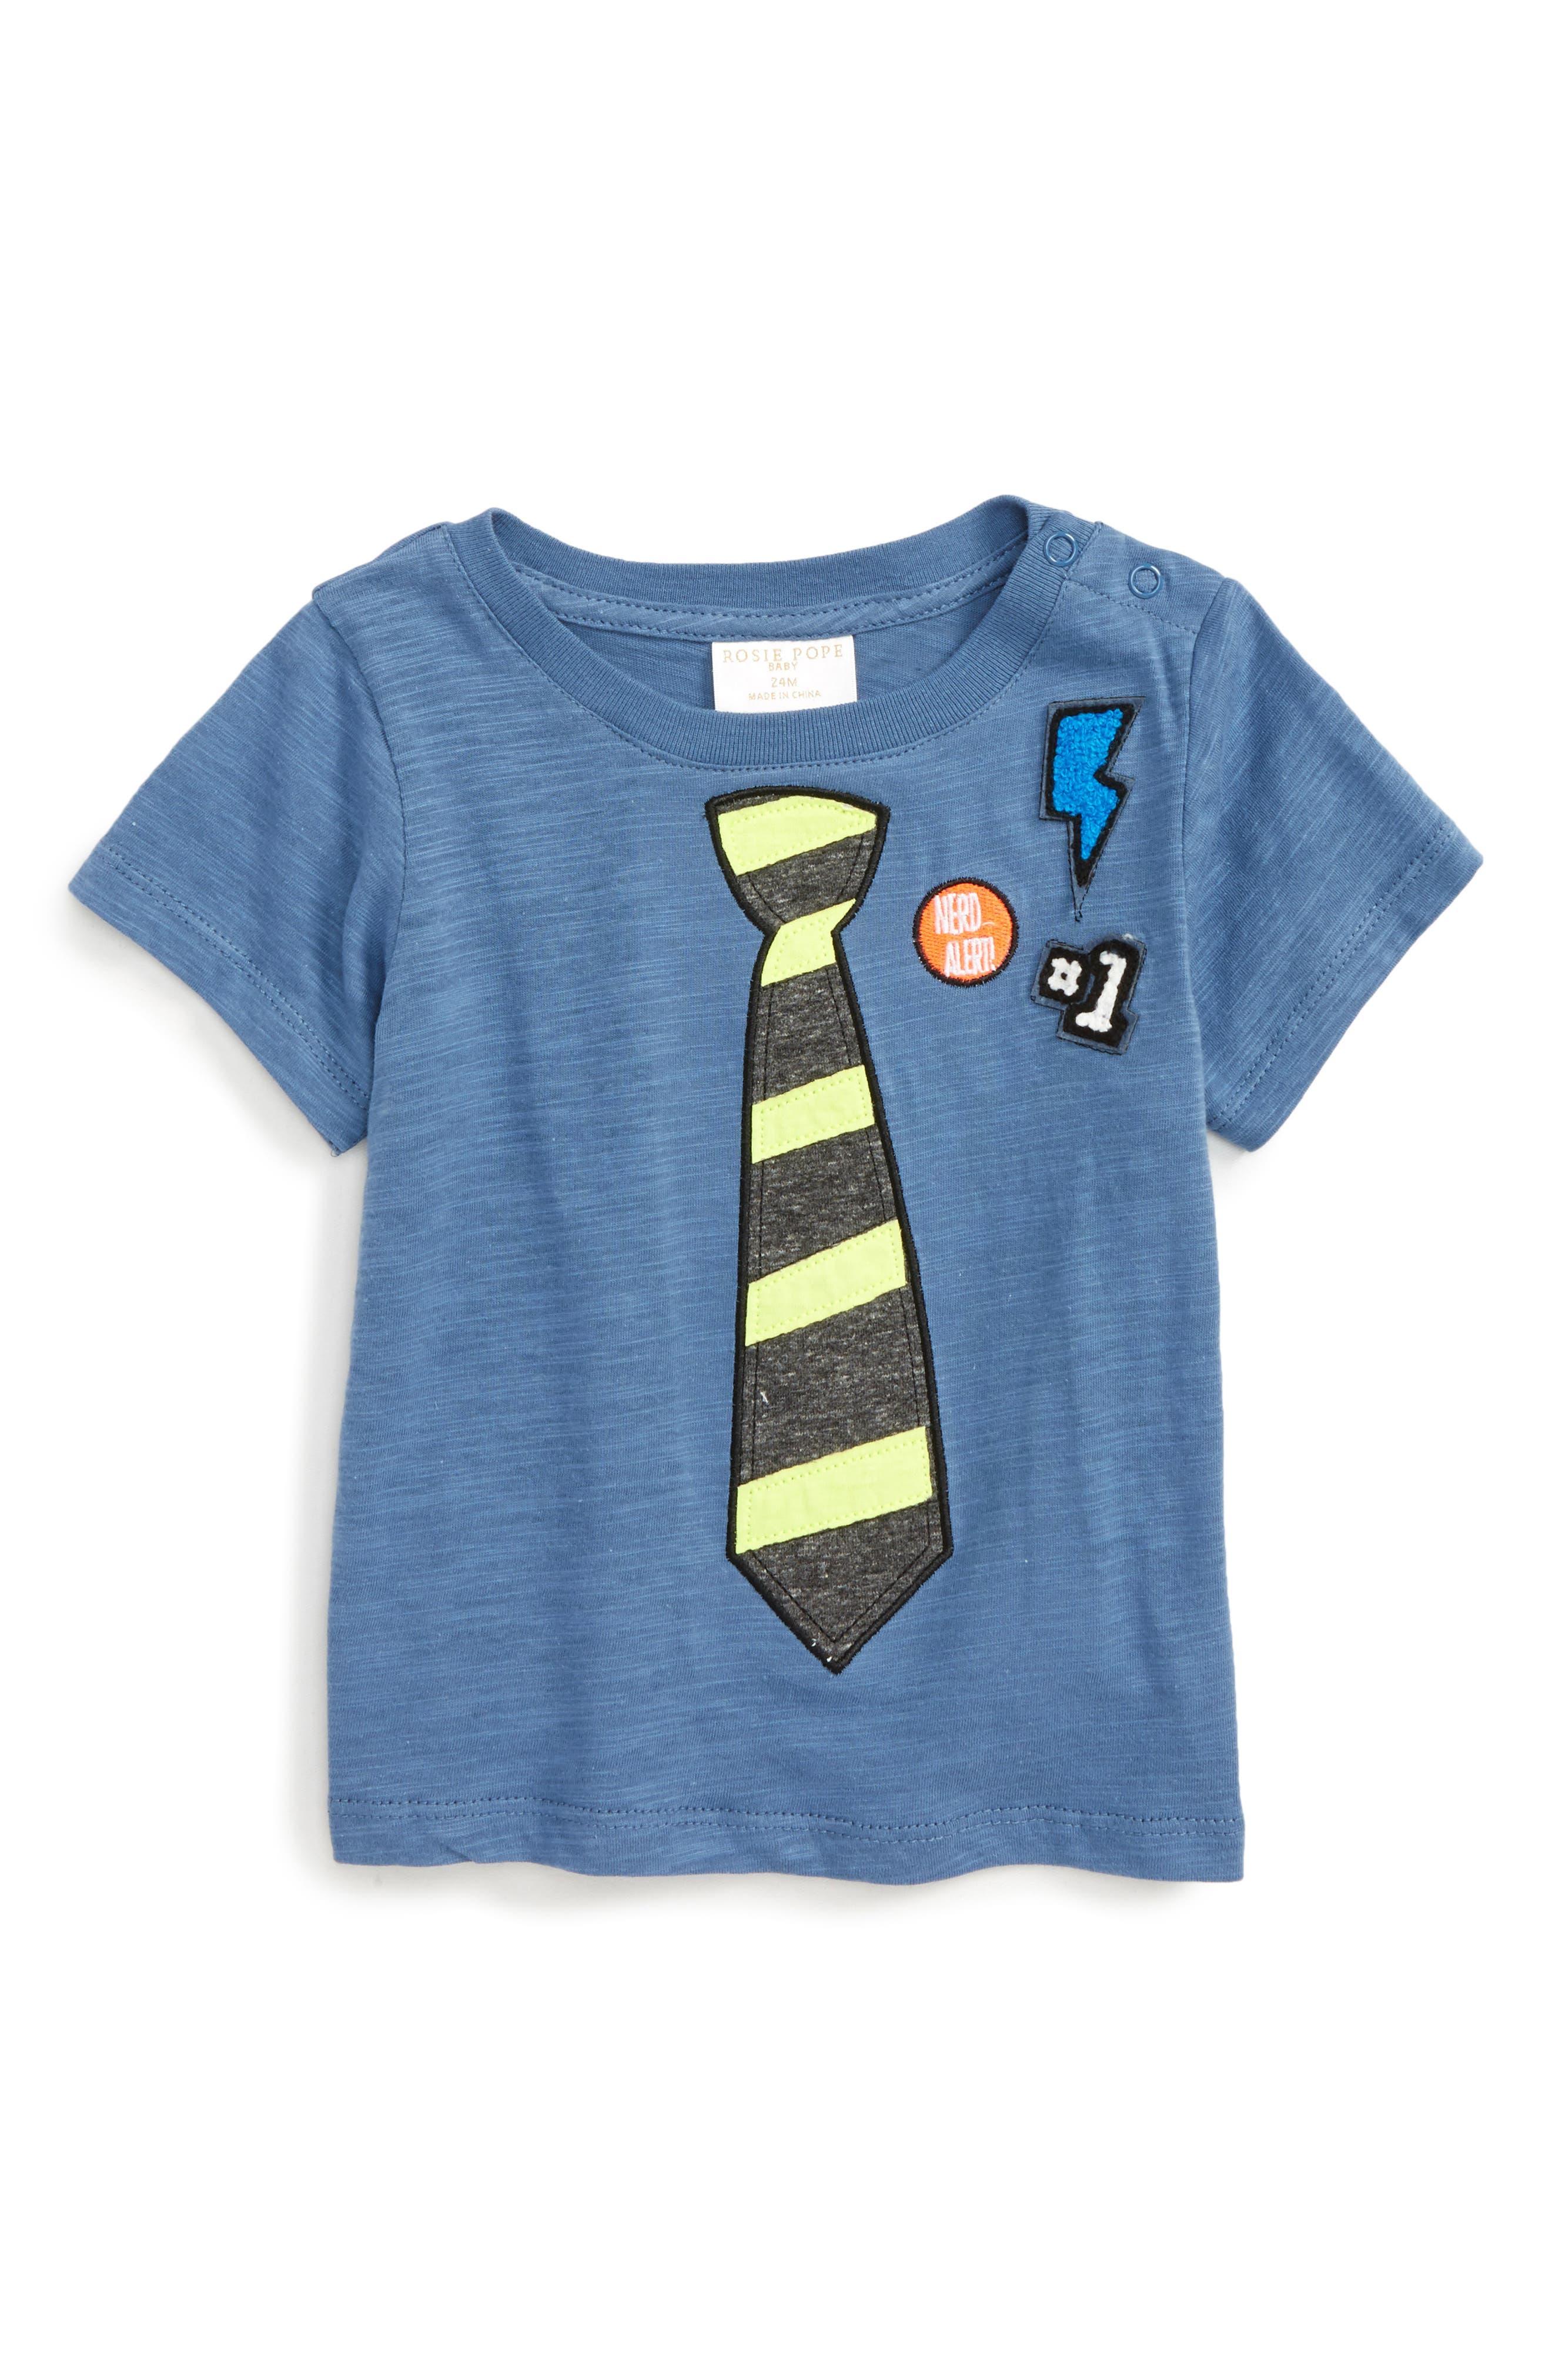 Rosie Pope Appliqué T-Shirt (Baby Boys)